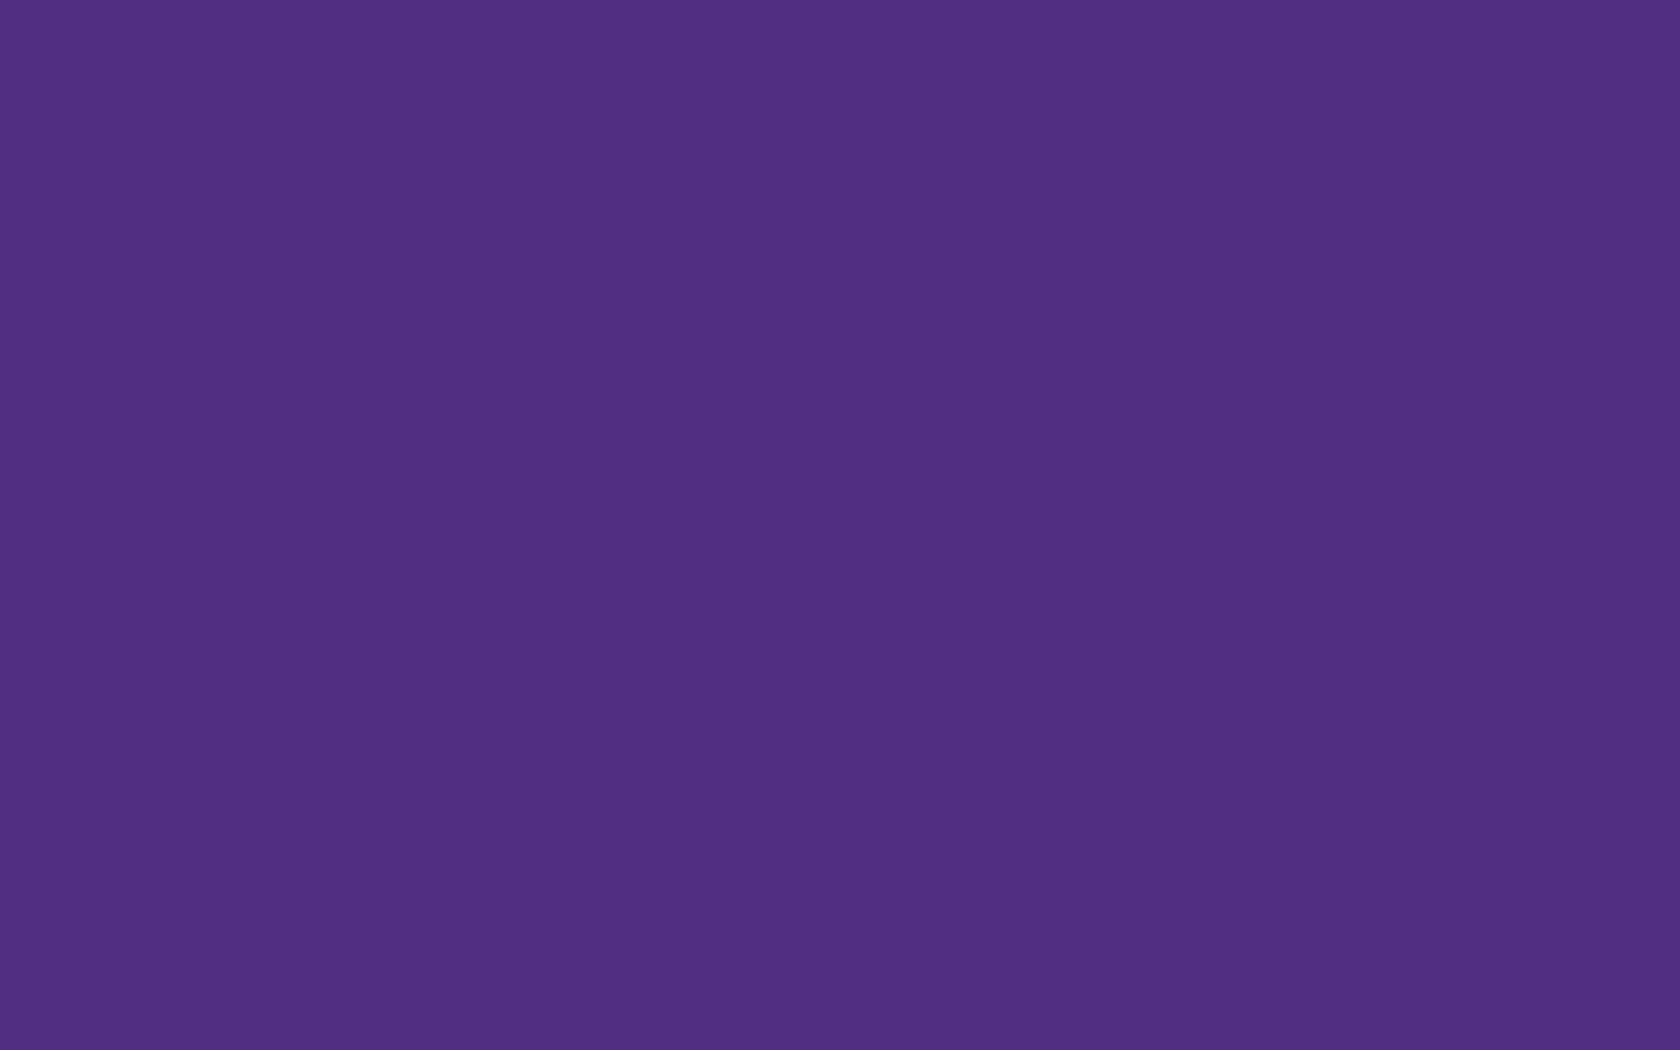 1680x1050 Regalia Solid Color Background